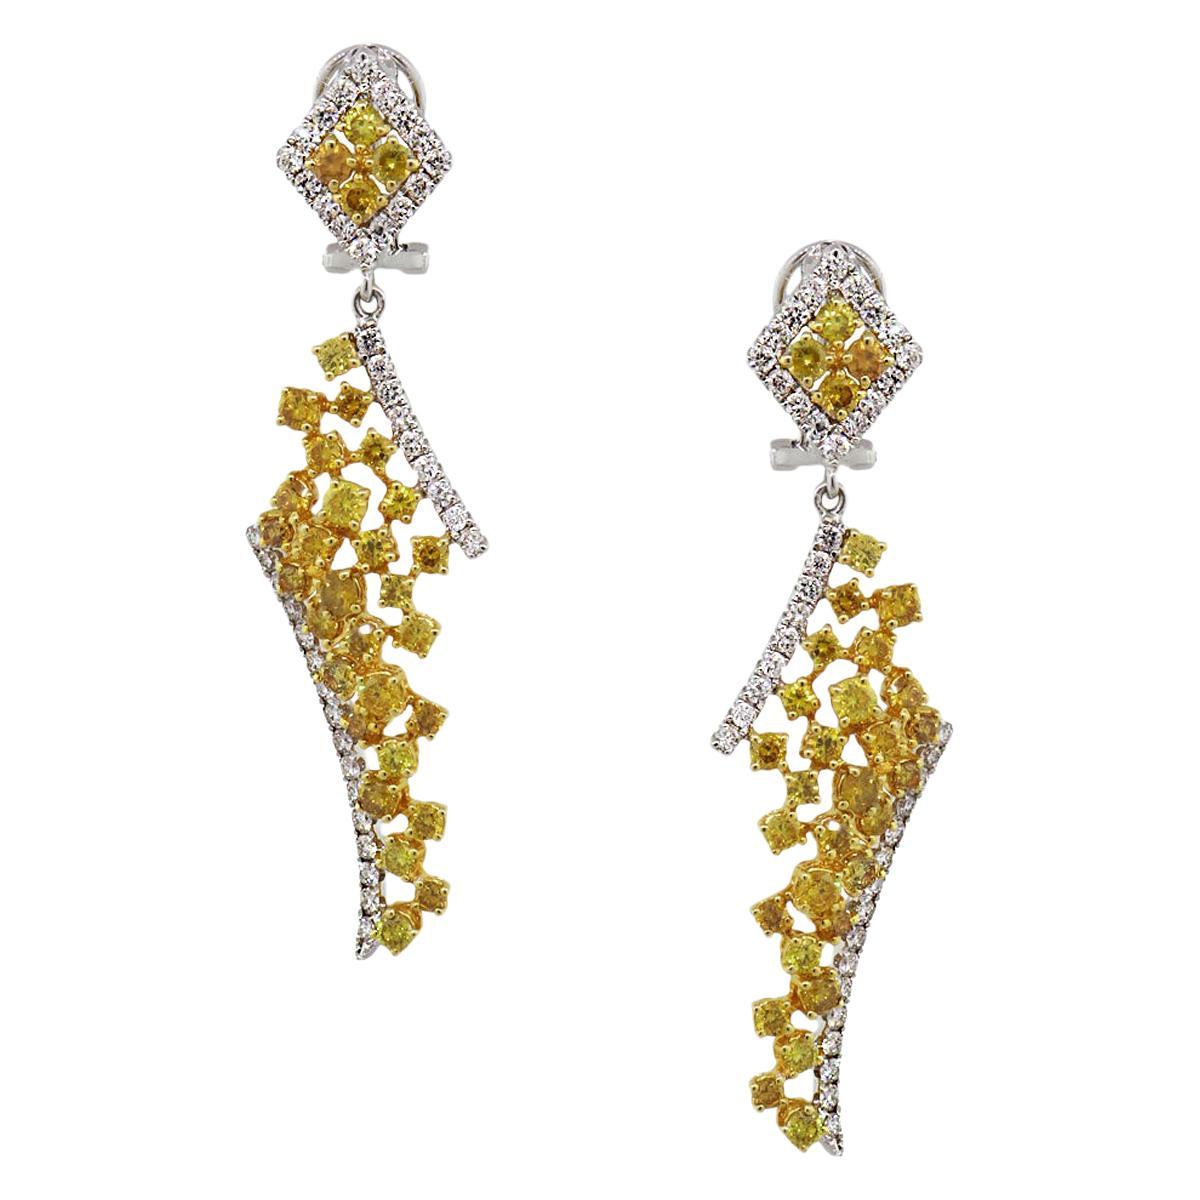 GIA Certified Fancy Vivid Yellow Diamond Drop Earrings